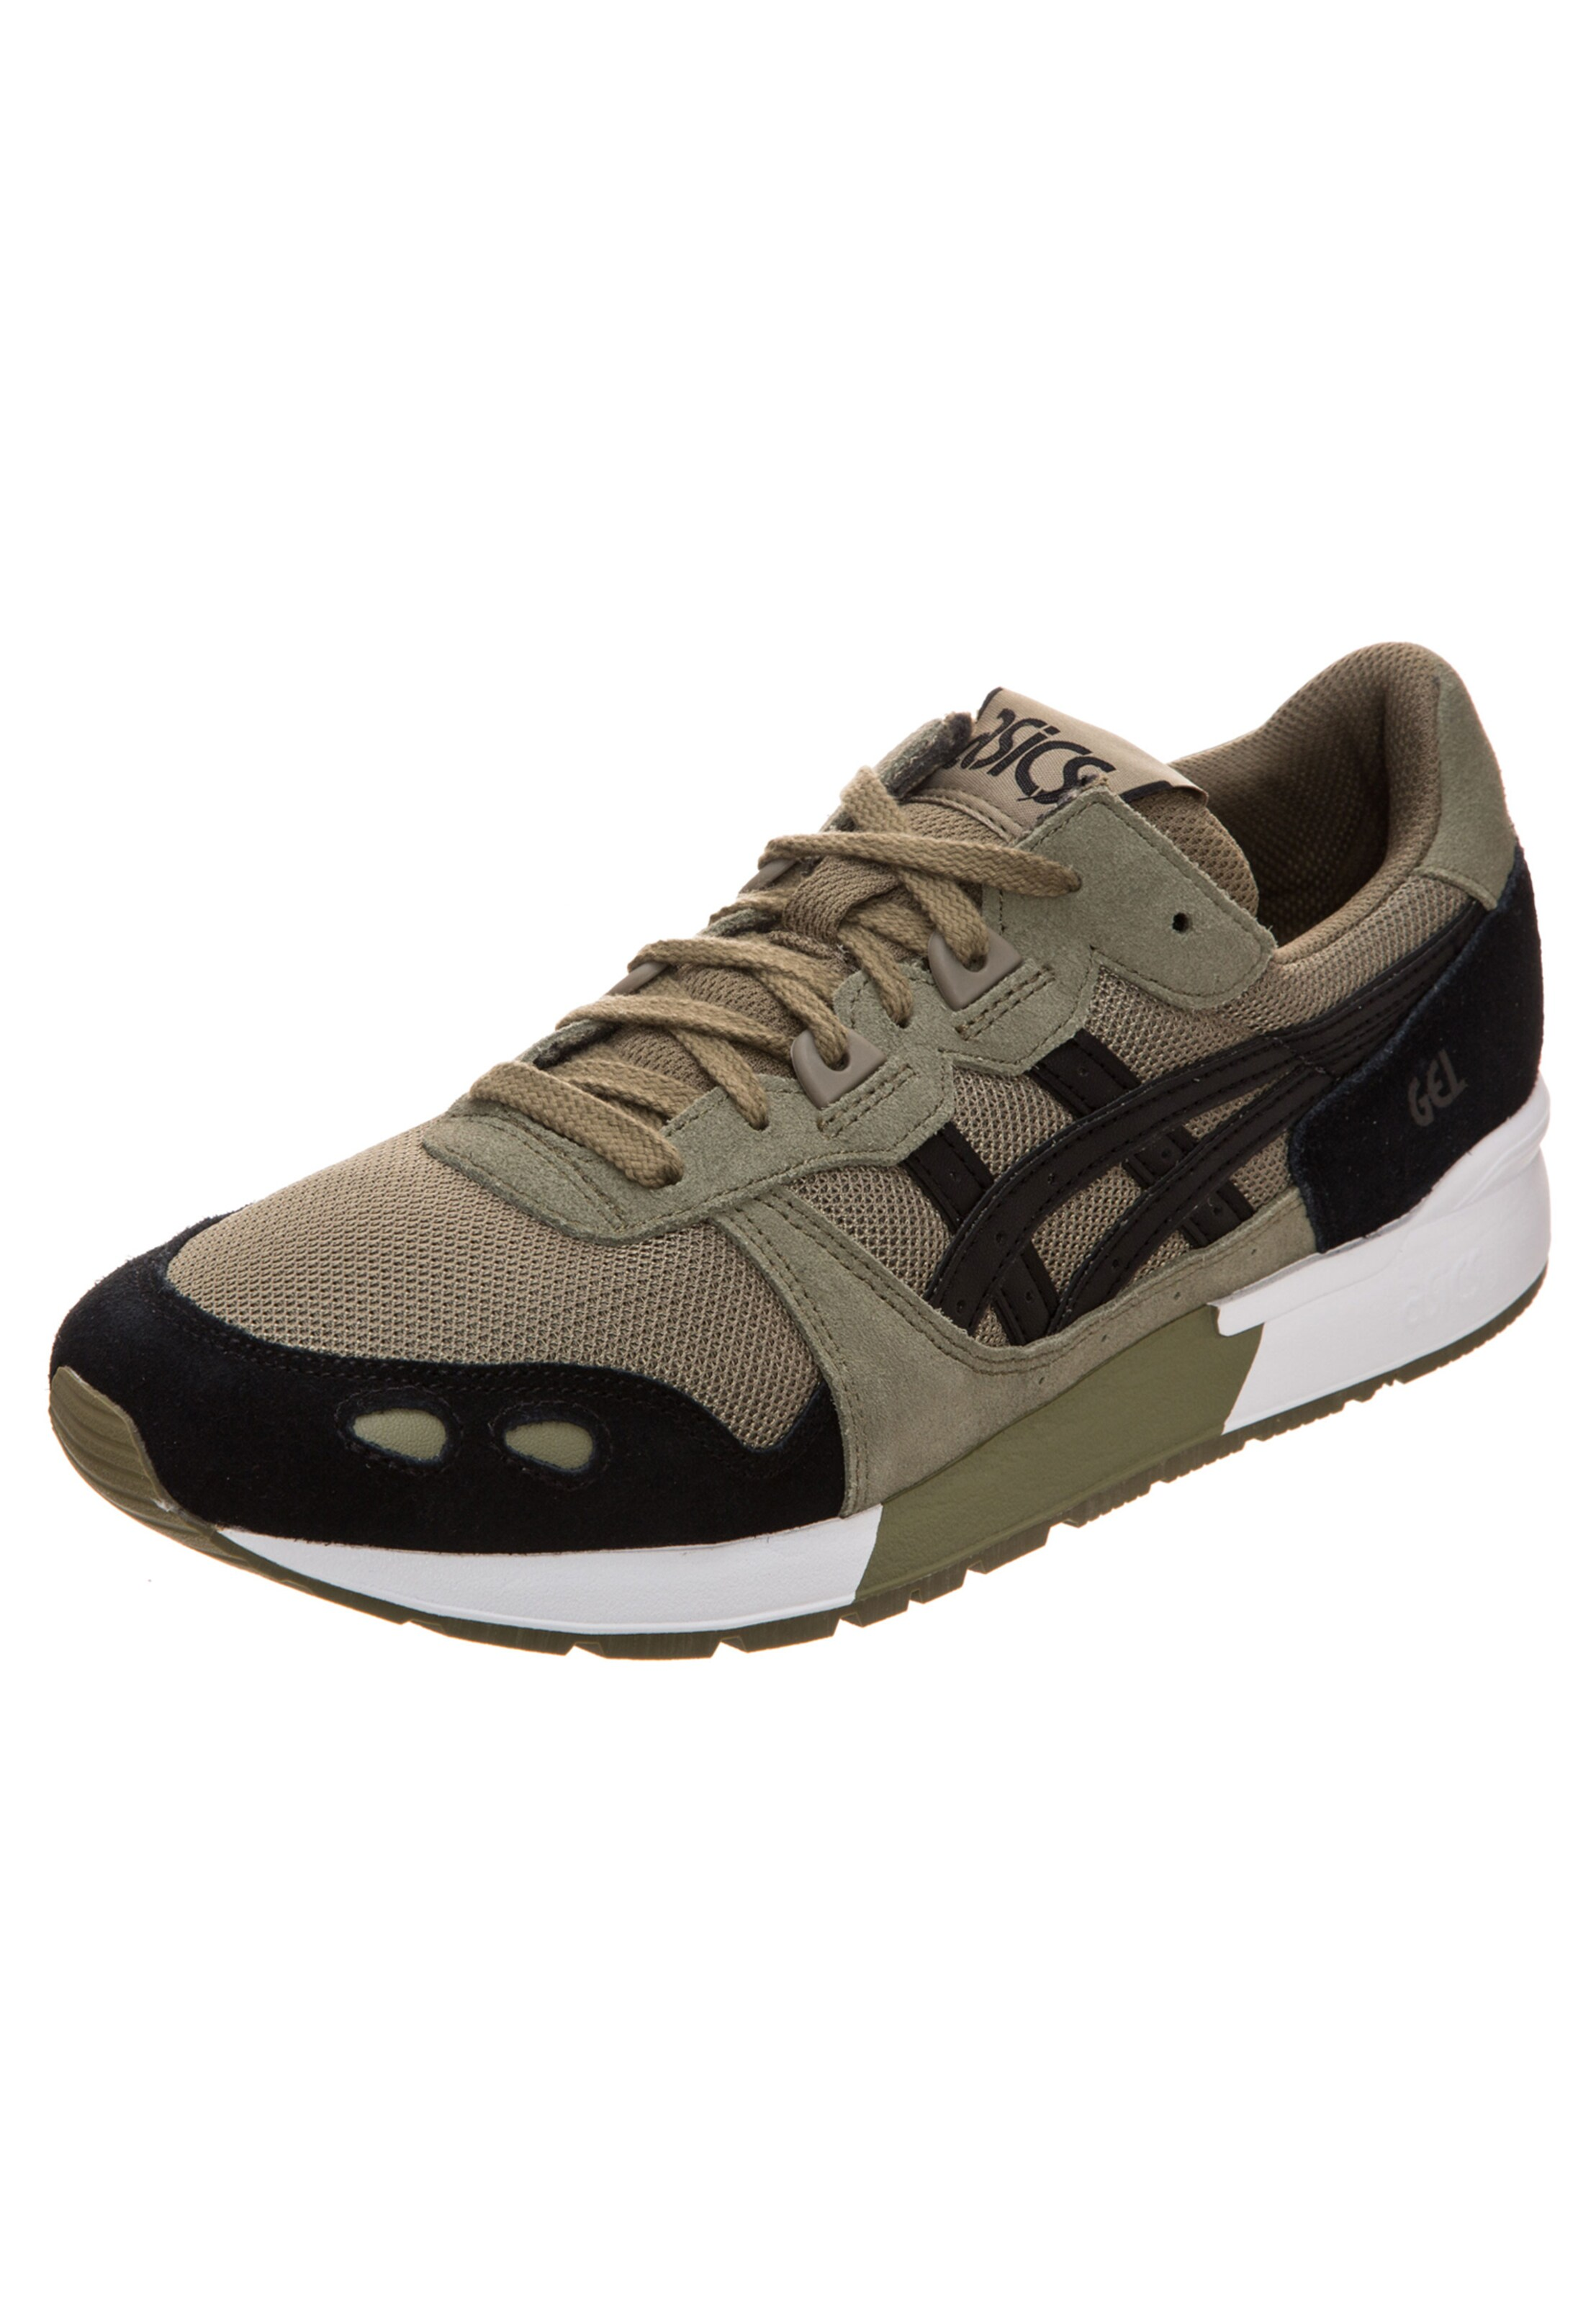 Asics Tiger Gel-Lyte Sneaker Verschleißfeste billige Schuhe